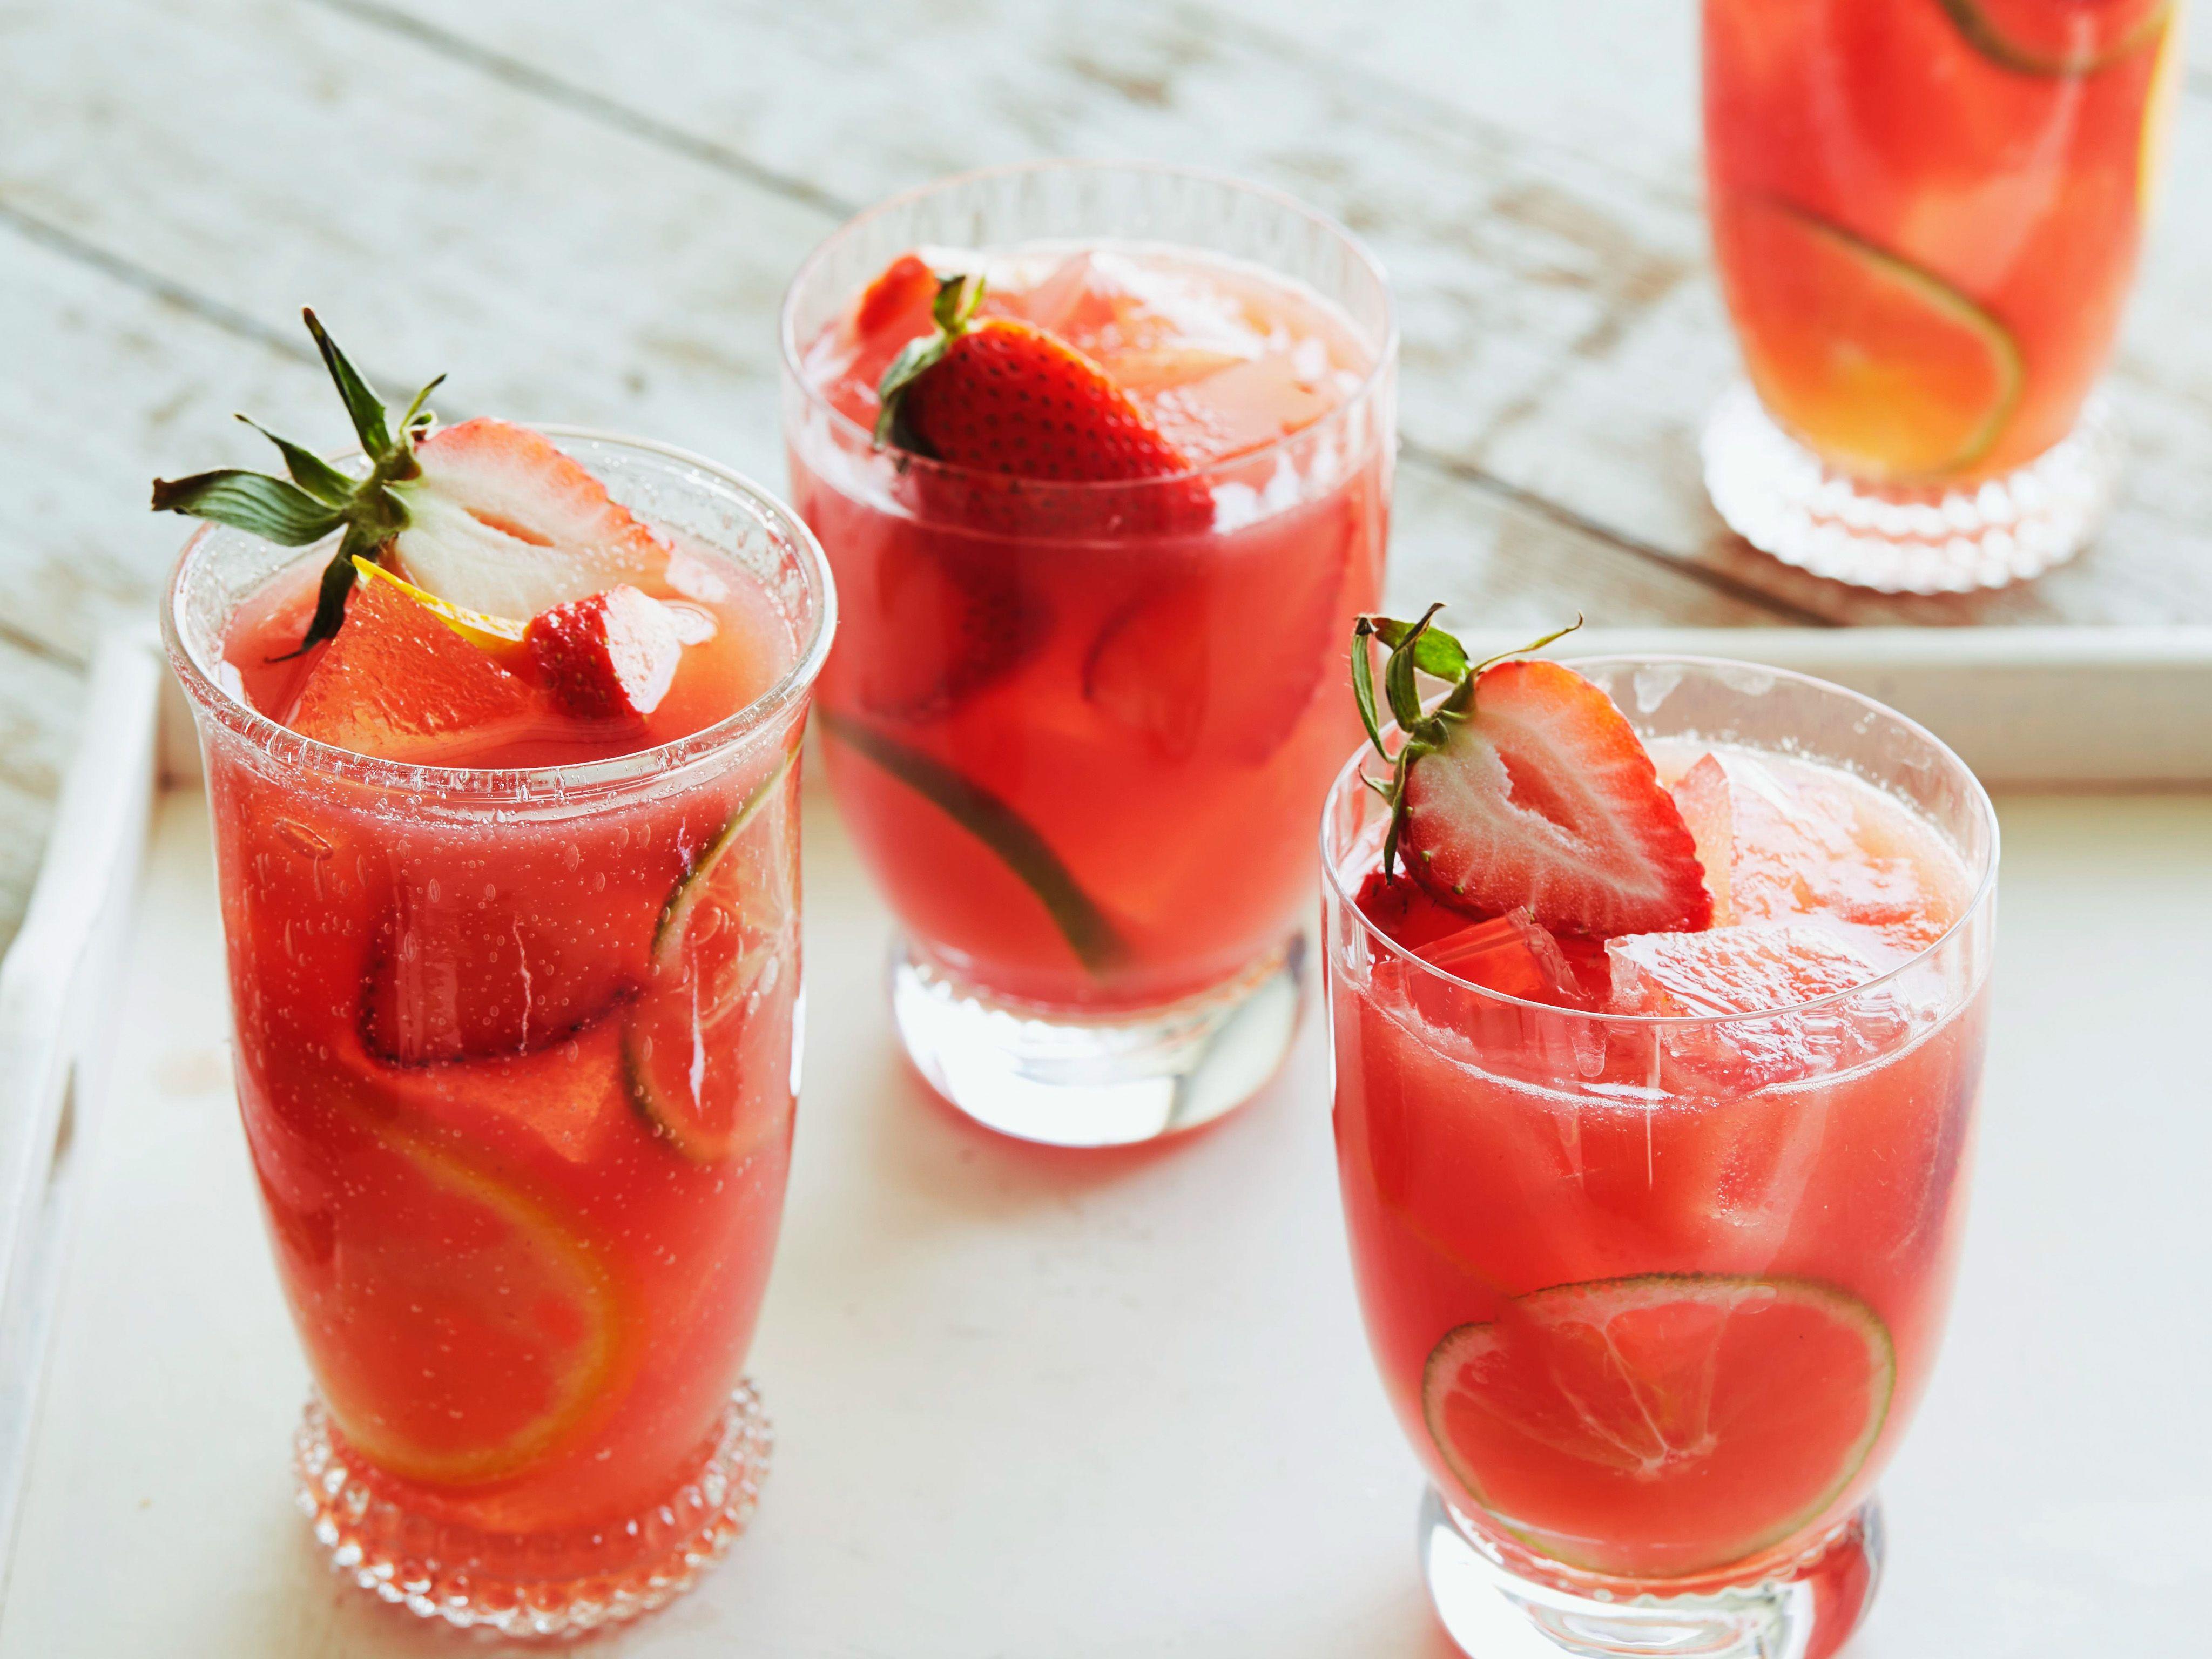 Watermelon Strawberry Sangria Recipe Strawberry Sangria Sangria Recipes Food Network Recipes